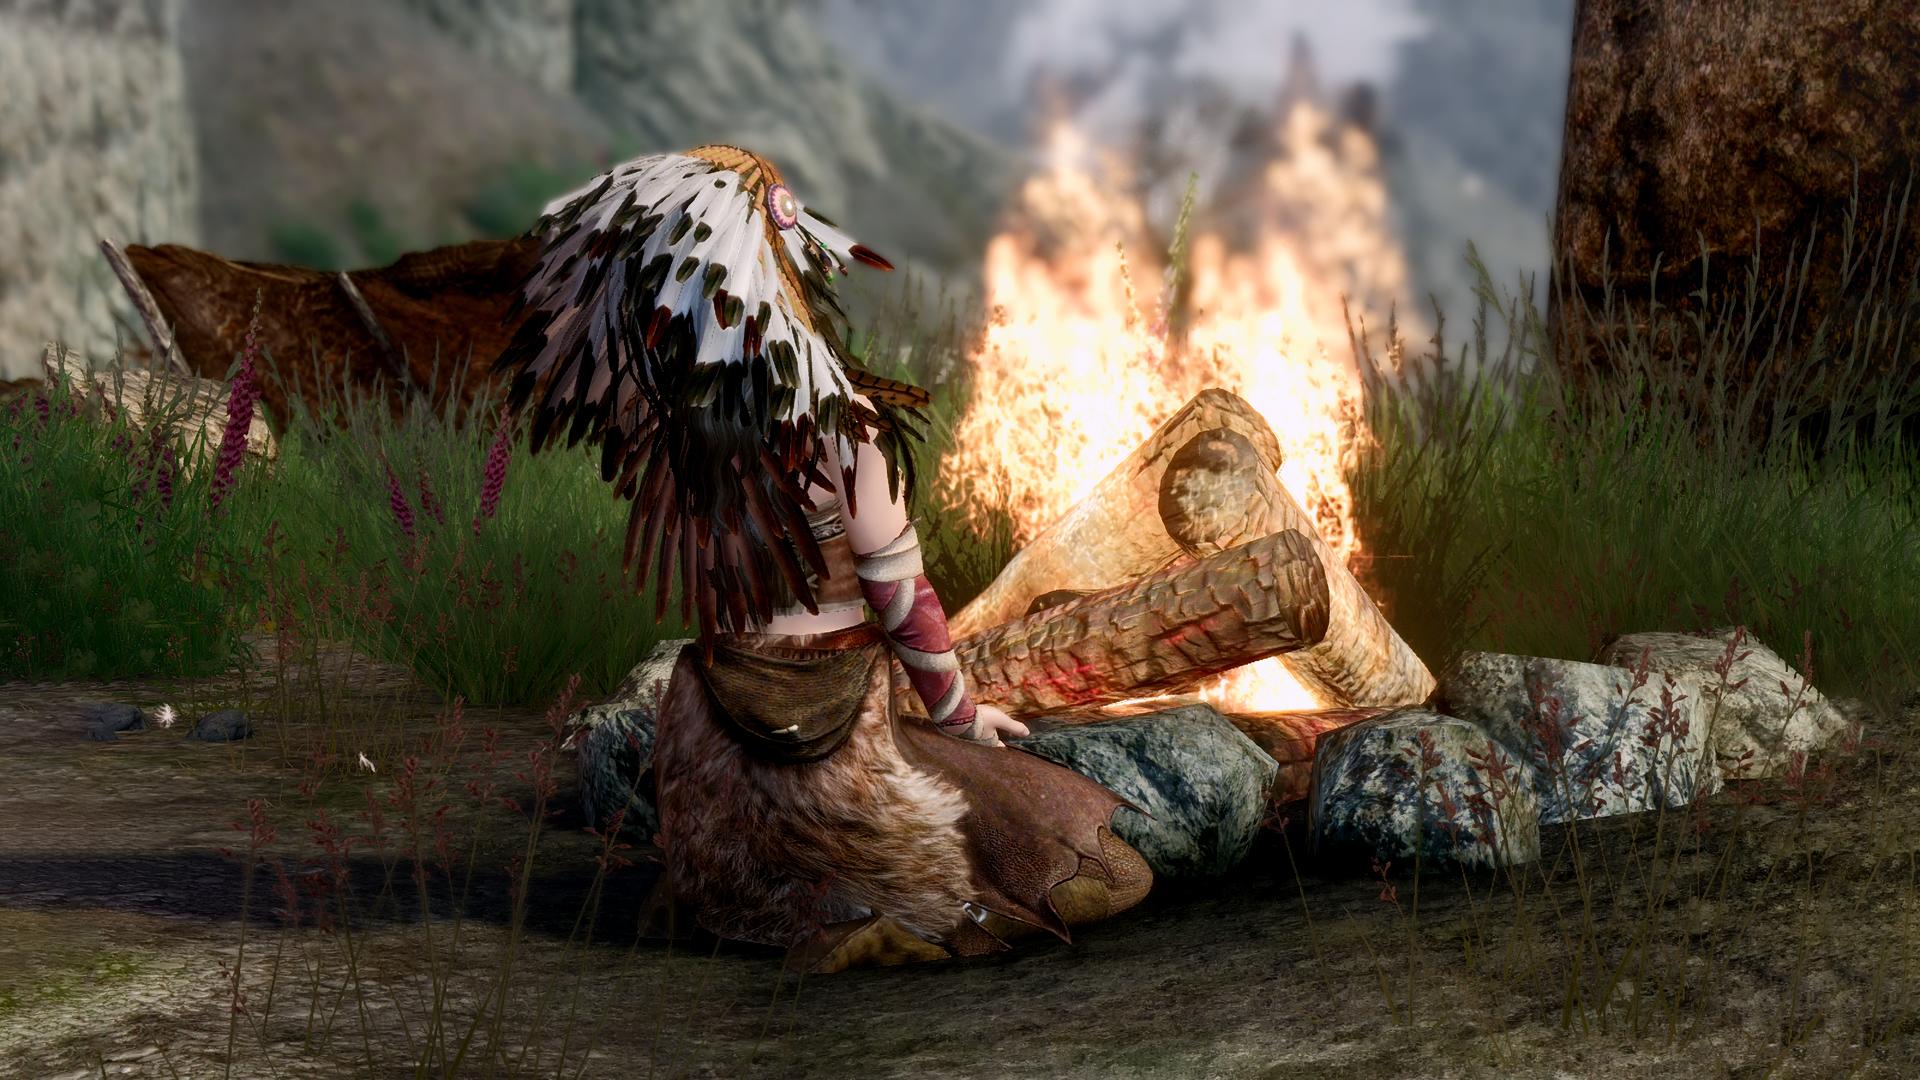 2.jpg - Elder Scrolls 5: Skyrim, the